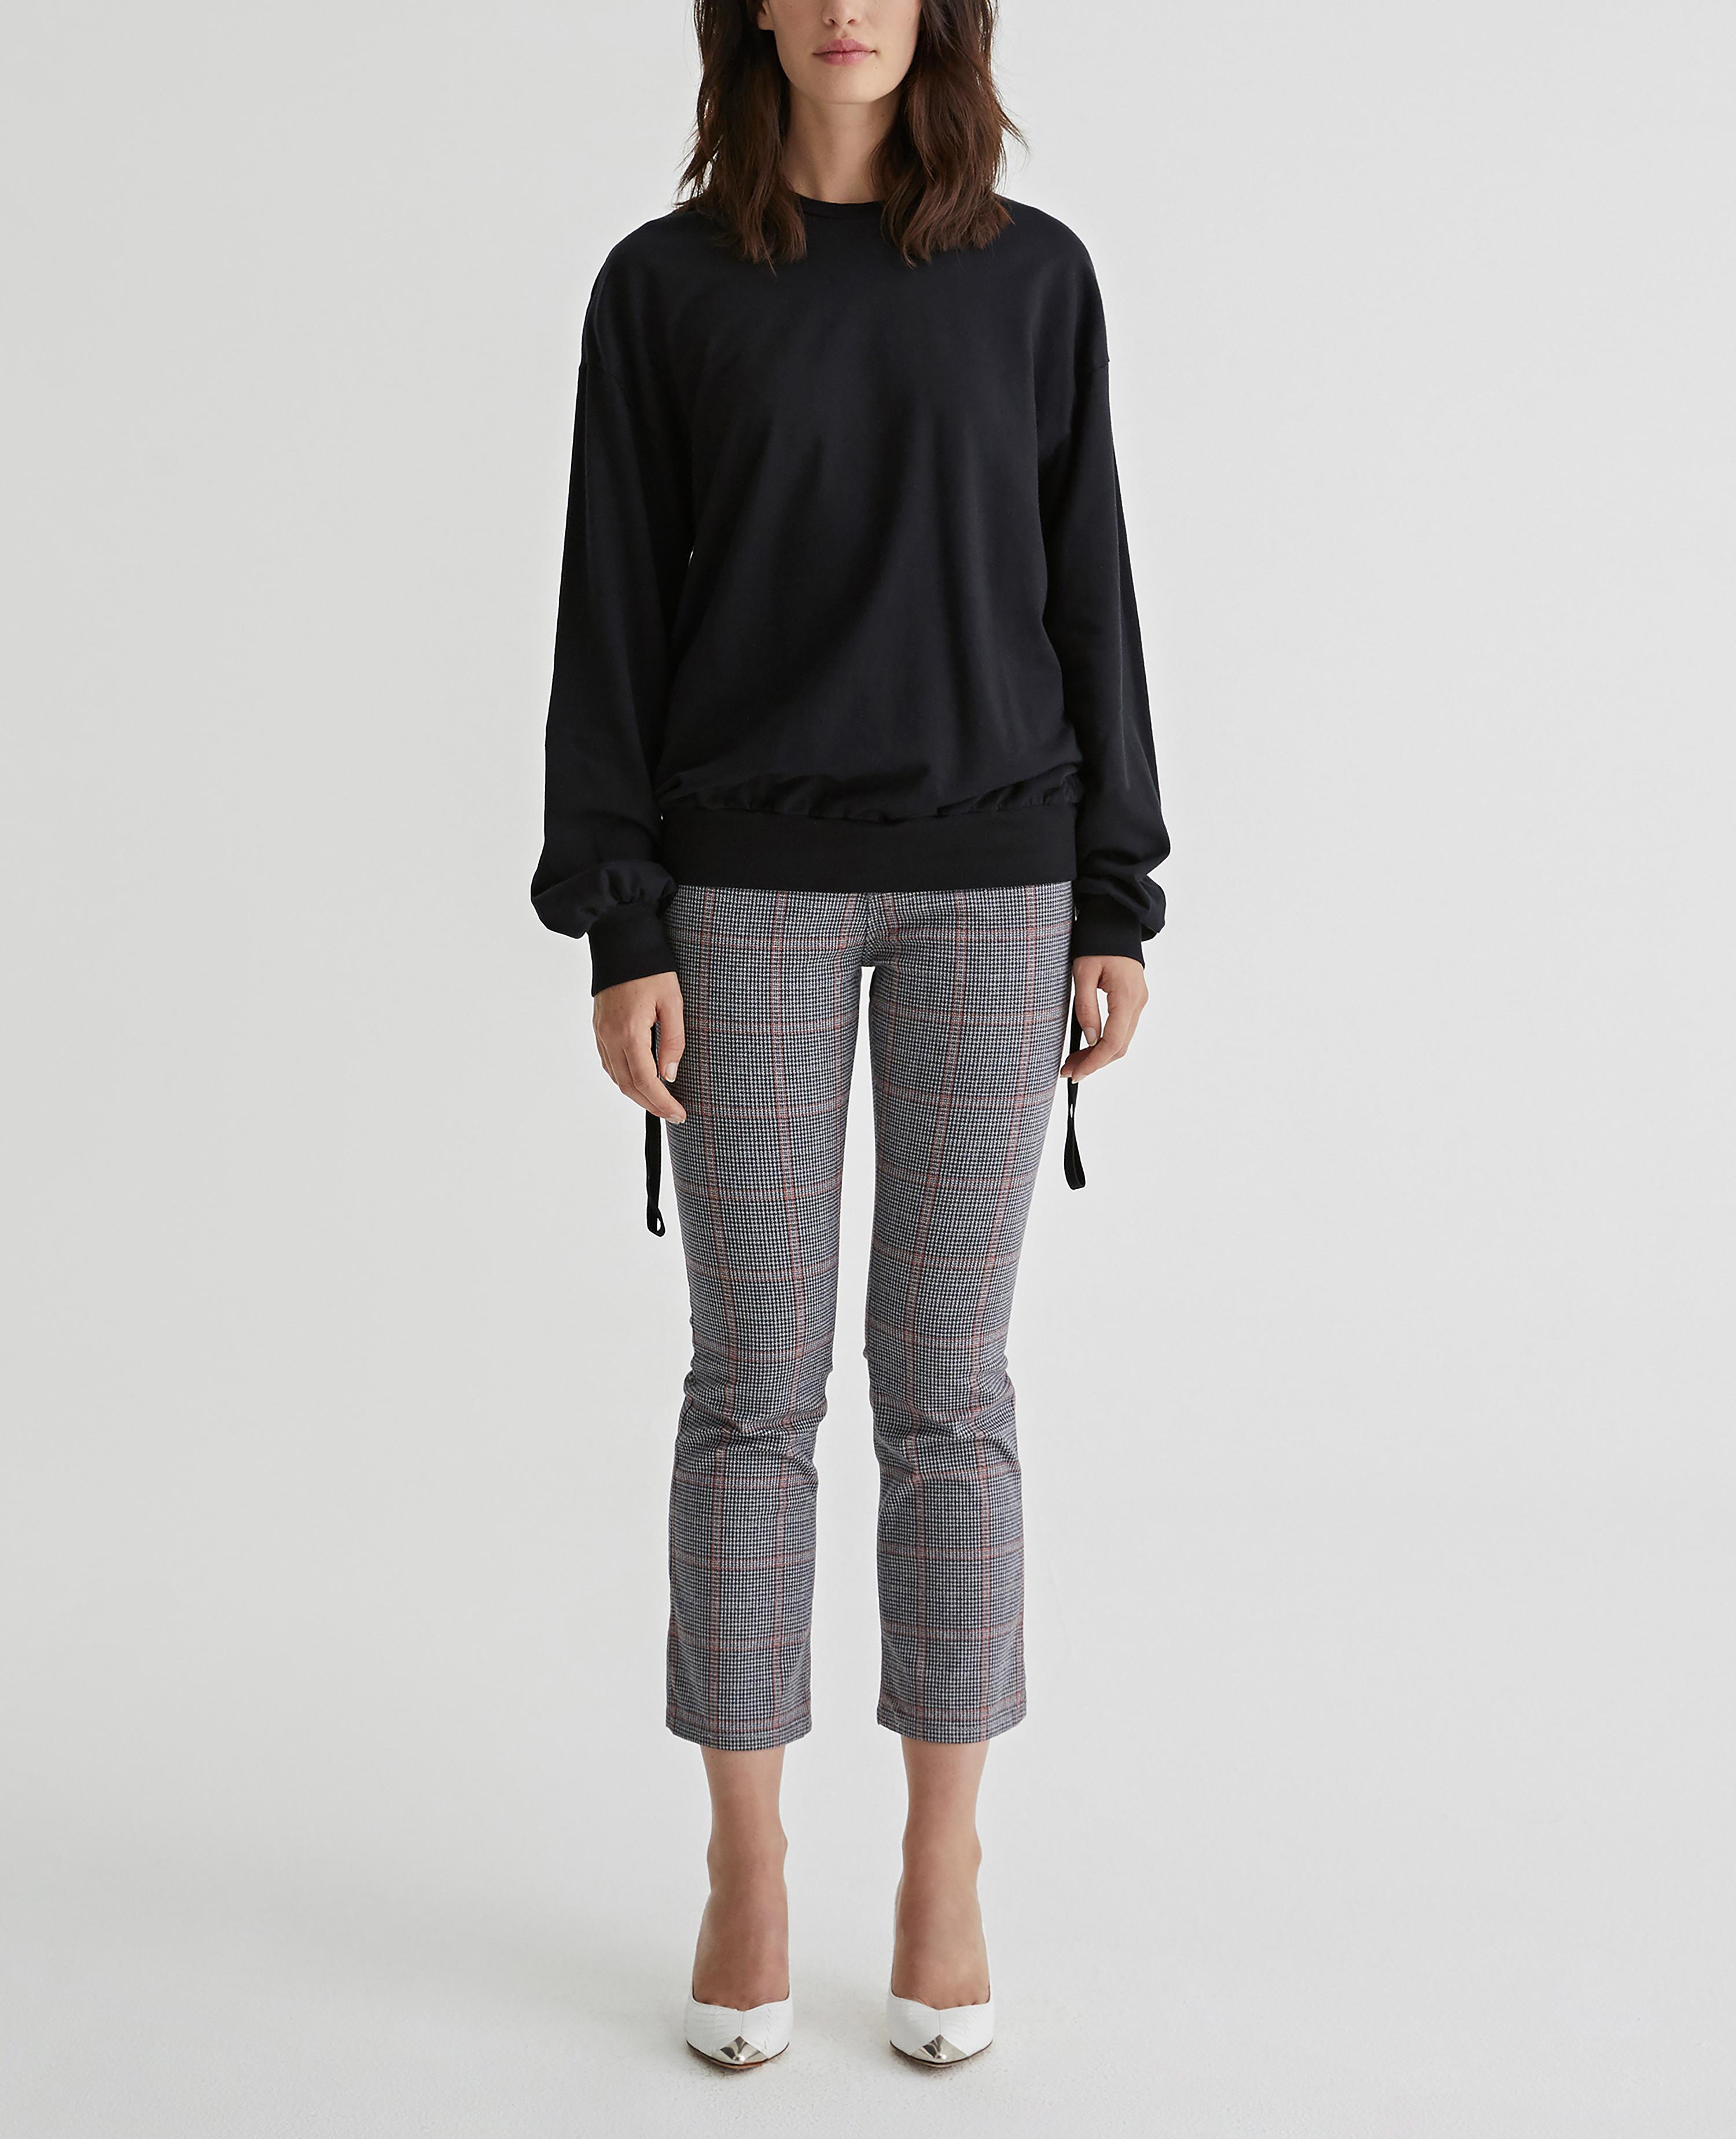 The Karis Sweatshirt